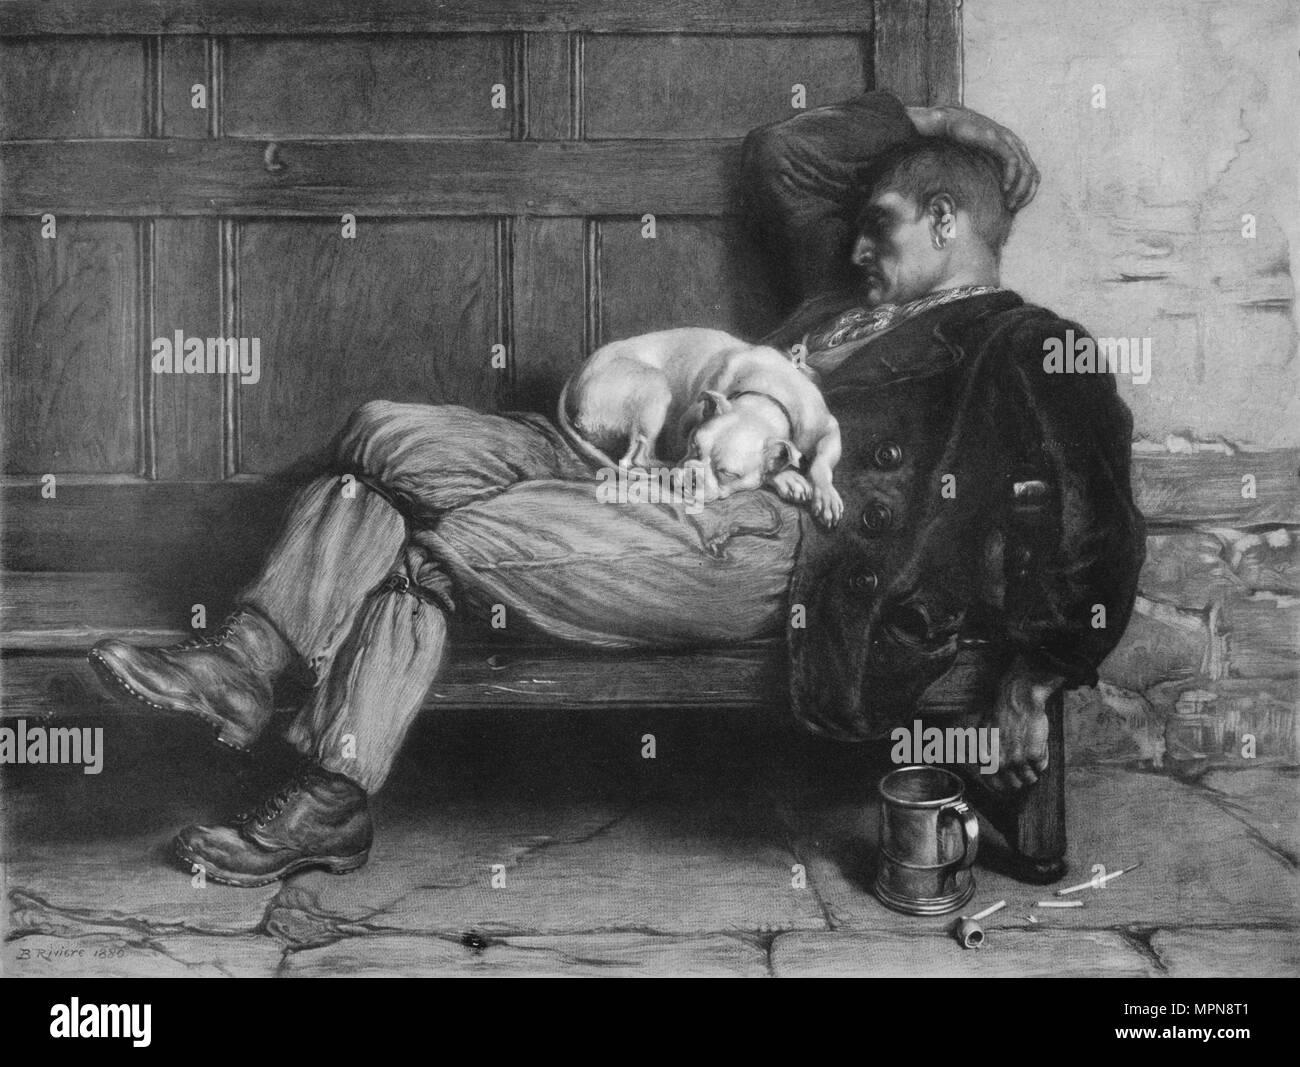 'Let Sleeping Dogs Lie!', 1880, (1912). Artist: Briton Riviere. Stock Photo